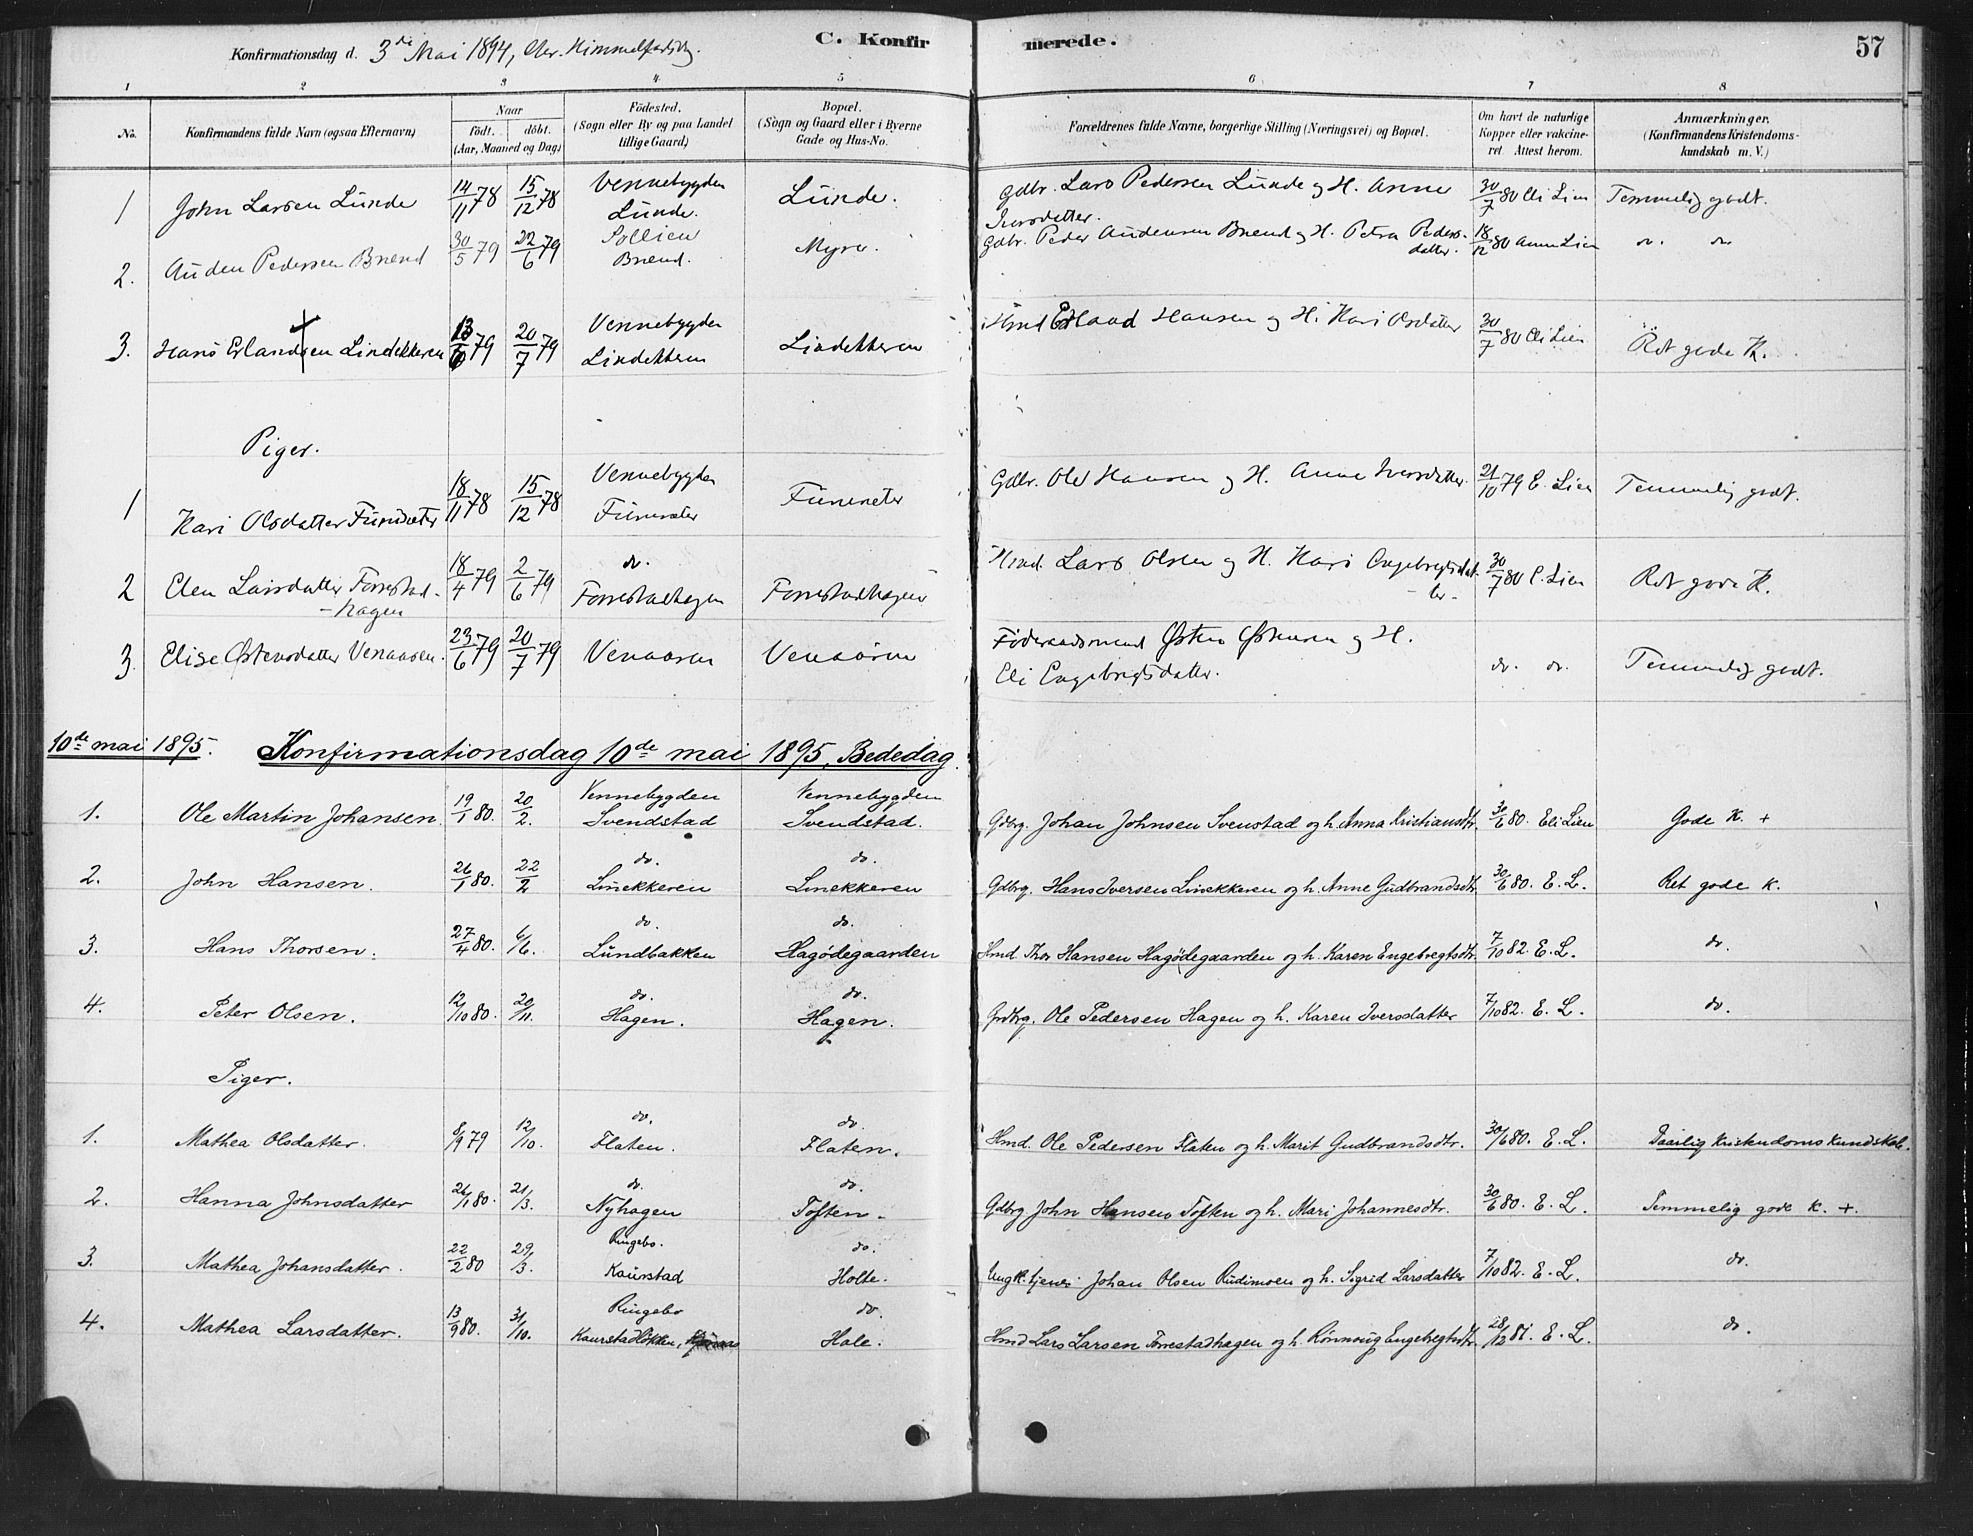 SAH, Ringebu prestekontor, Ministerialbok nr. 10, 1878-1898, s. 57